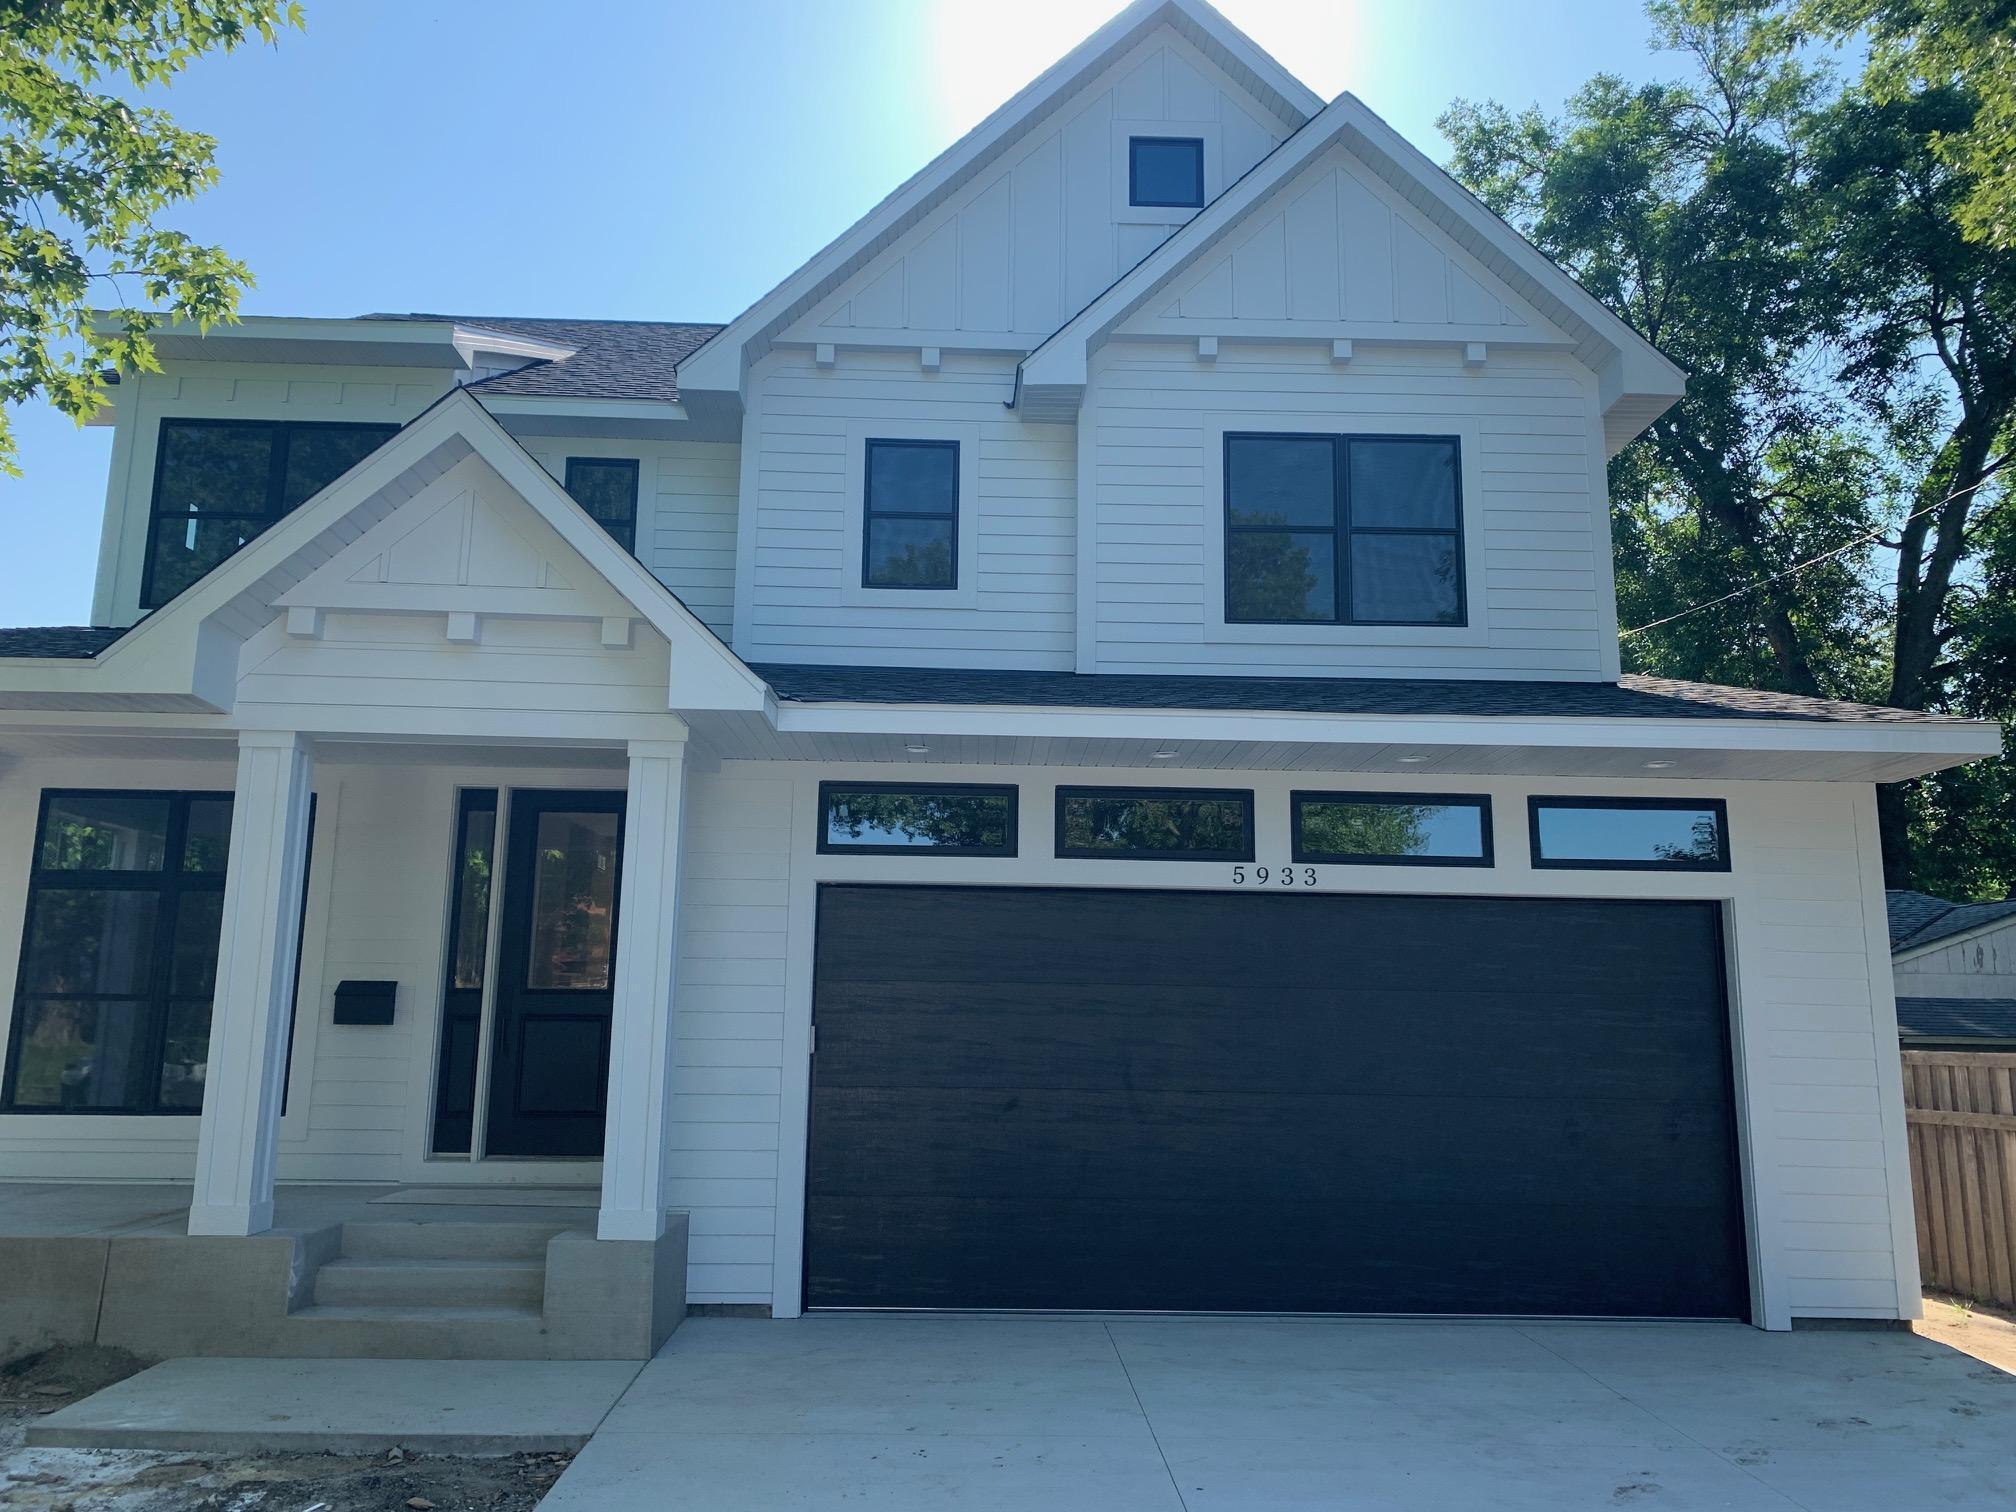 5933 Morgan Avenue S Property Photo - Minneapolis, MN real estate listing